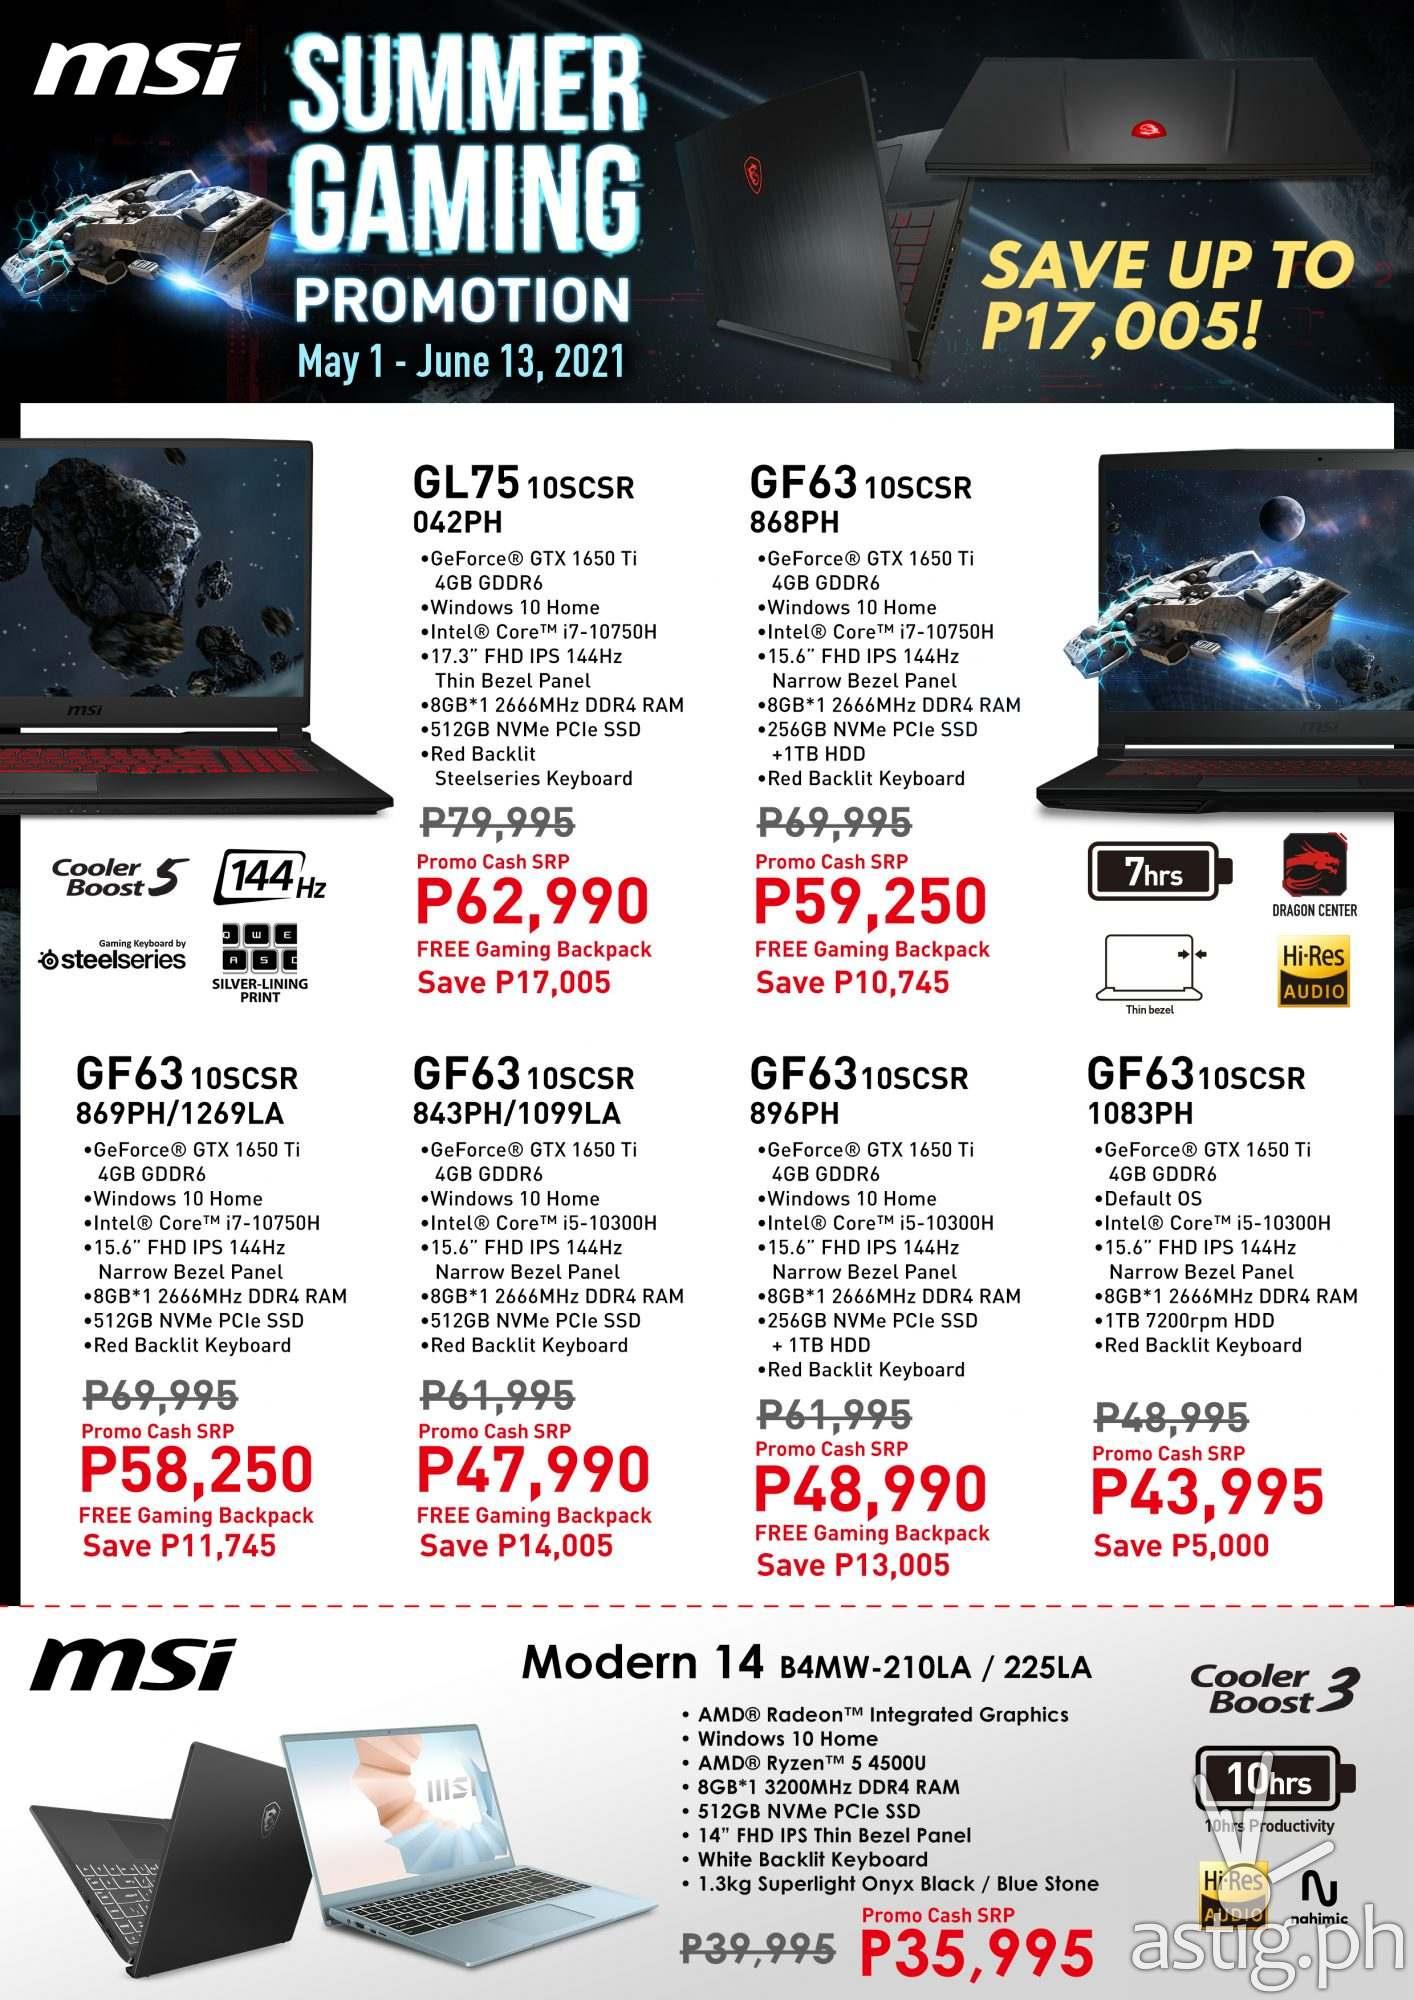 MSI Summer Gaming Pro